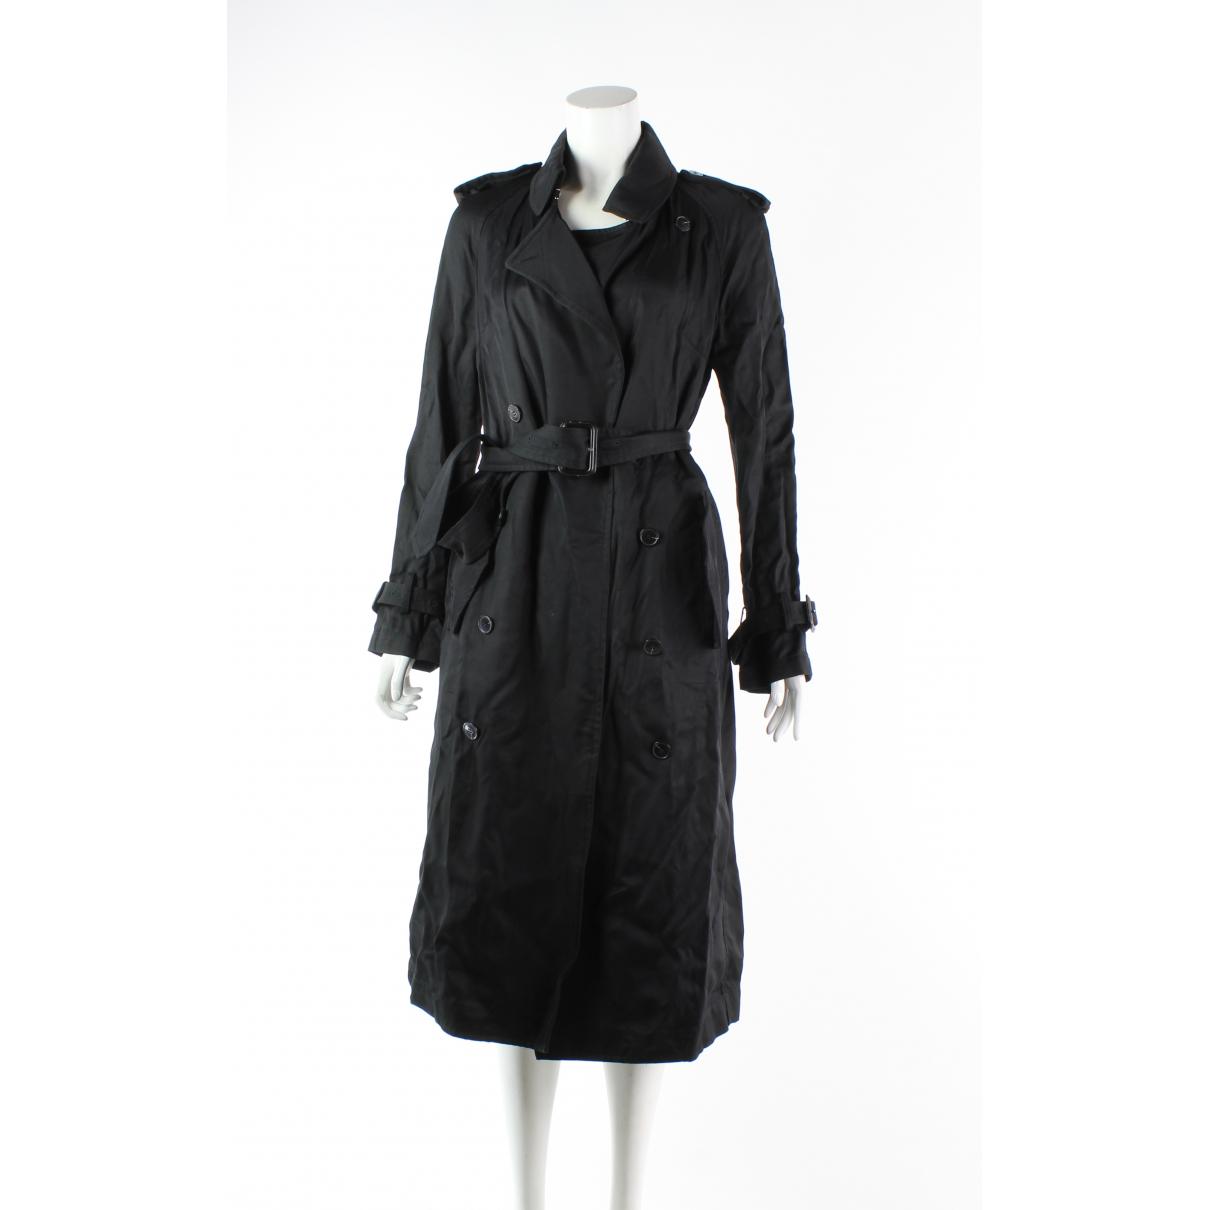 Victoria Beckham \N Black Trench coat for Women 10 UK